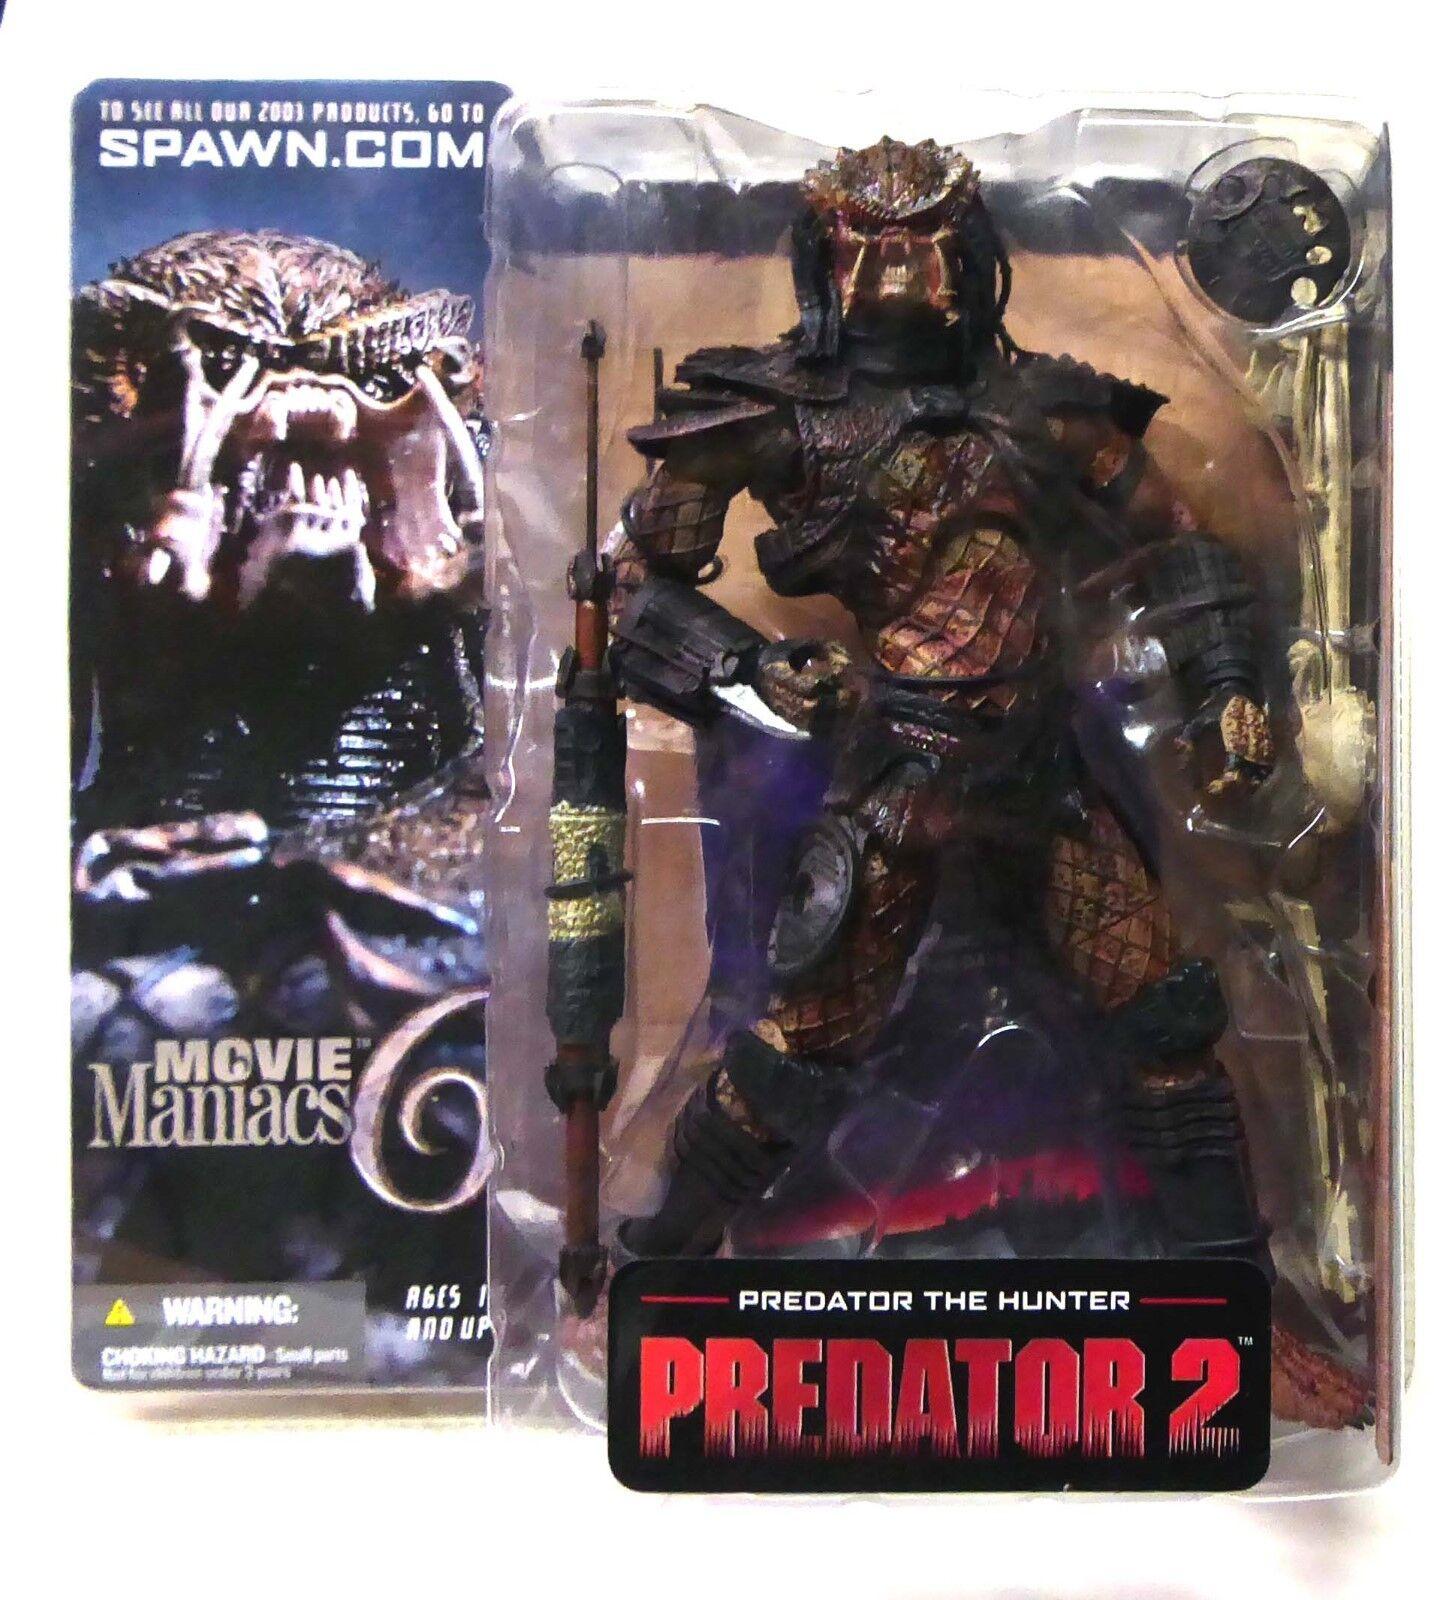 McFarlane Movie Maniacs 6 Predator 2 The Hunter Action Figure .